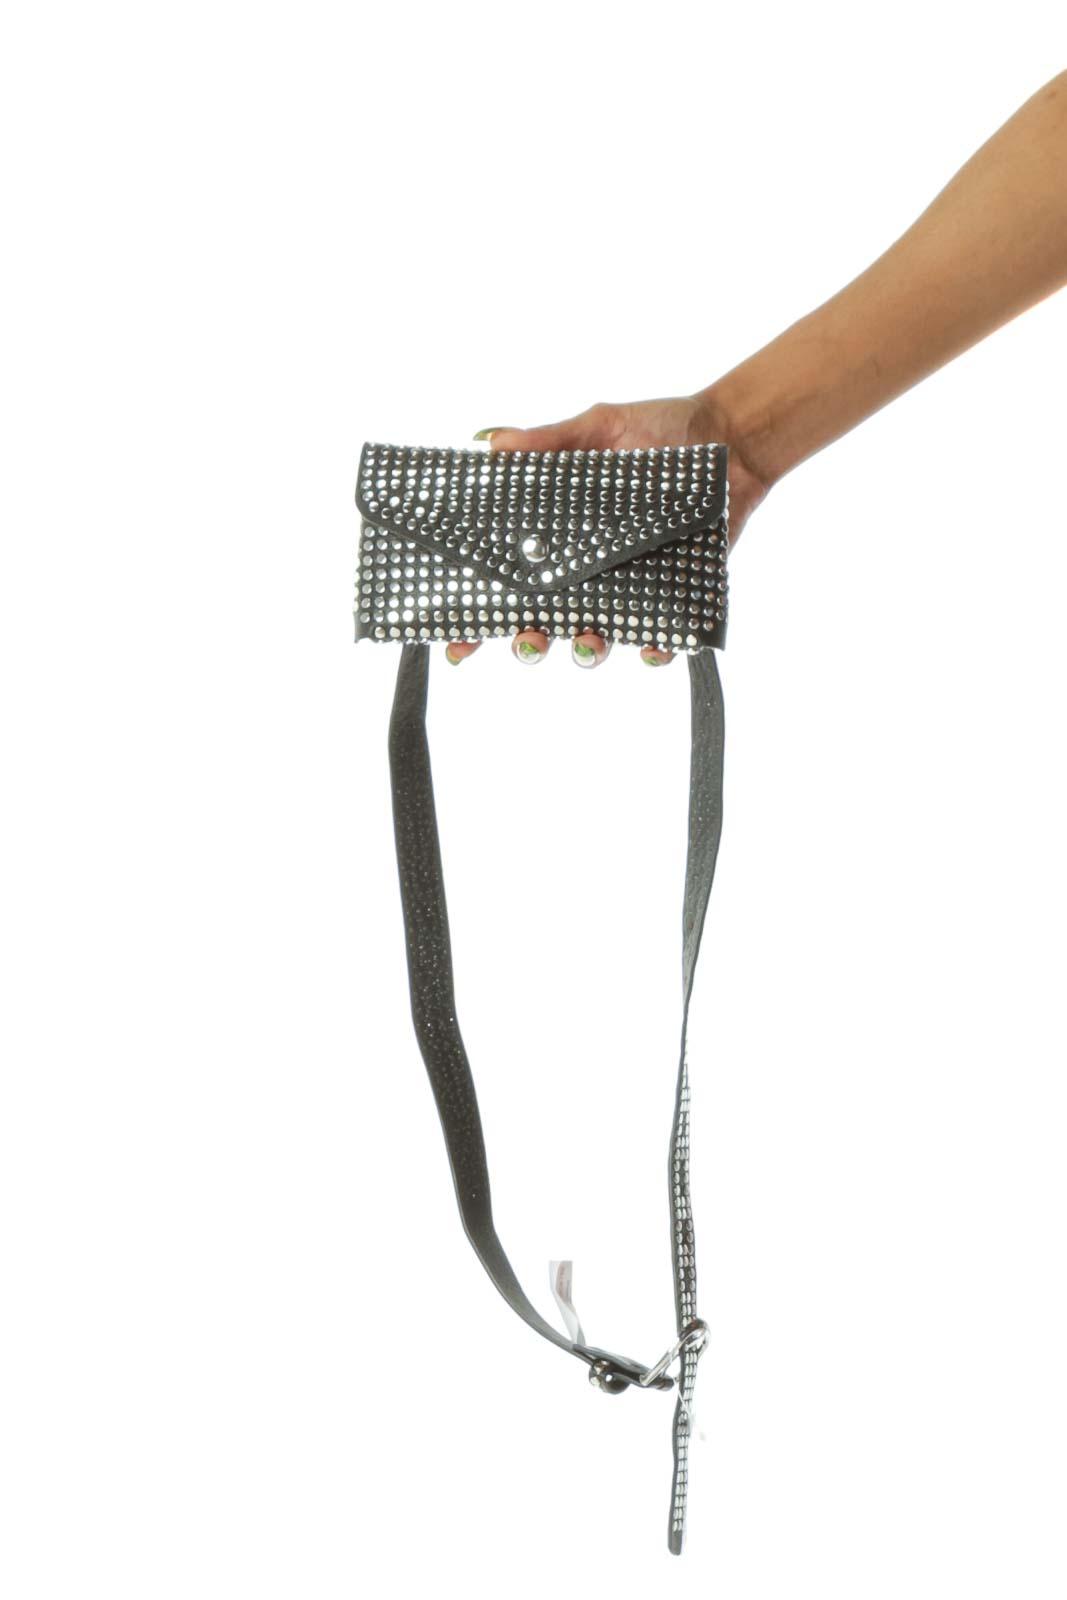 Black Studded Snap Button Closure Belt Bag